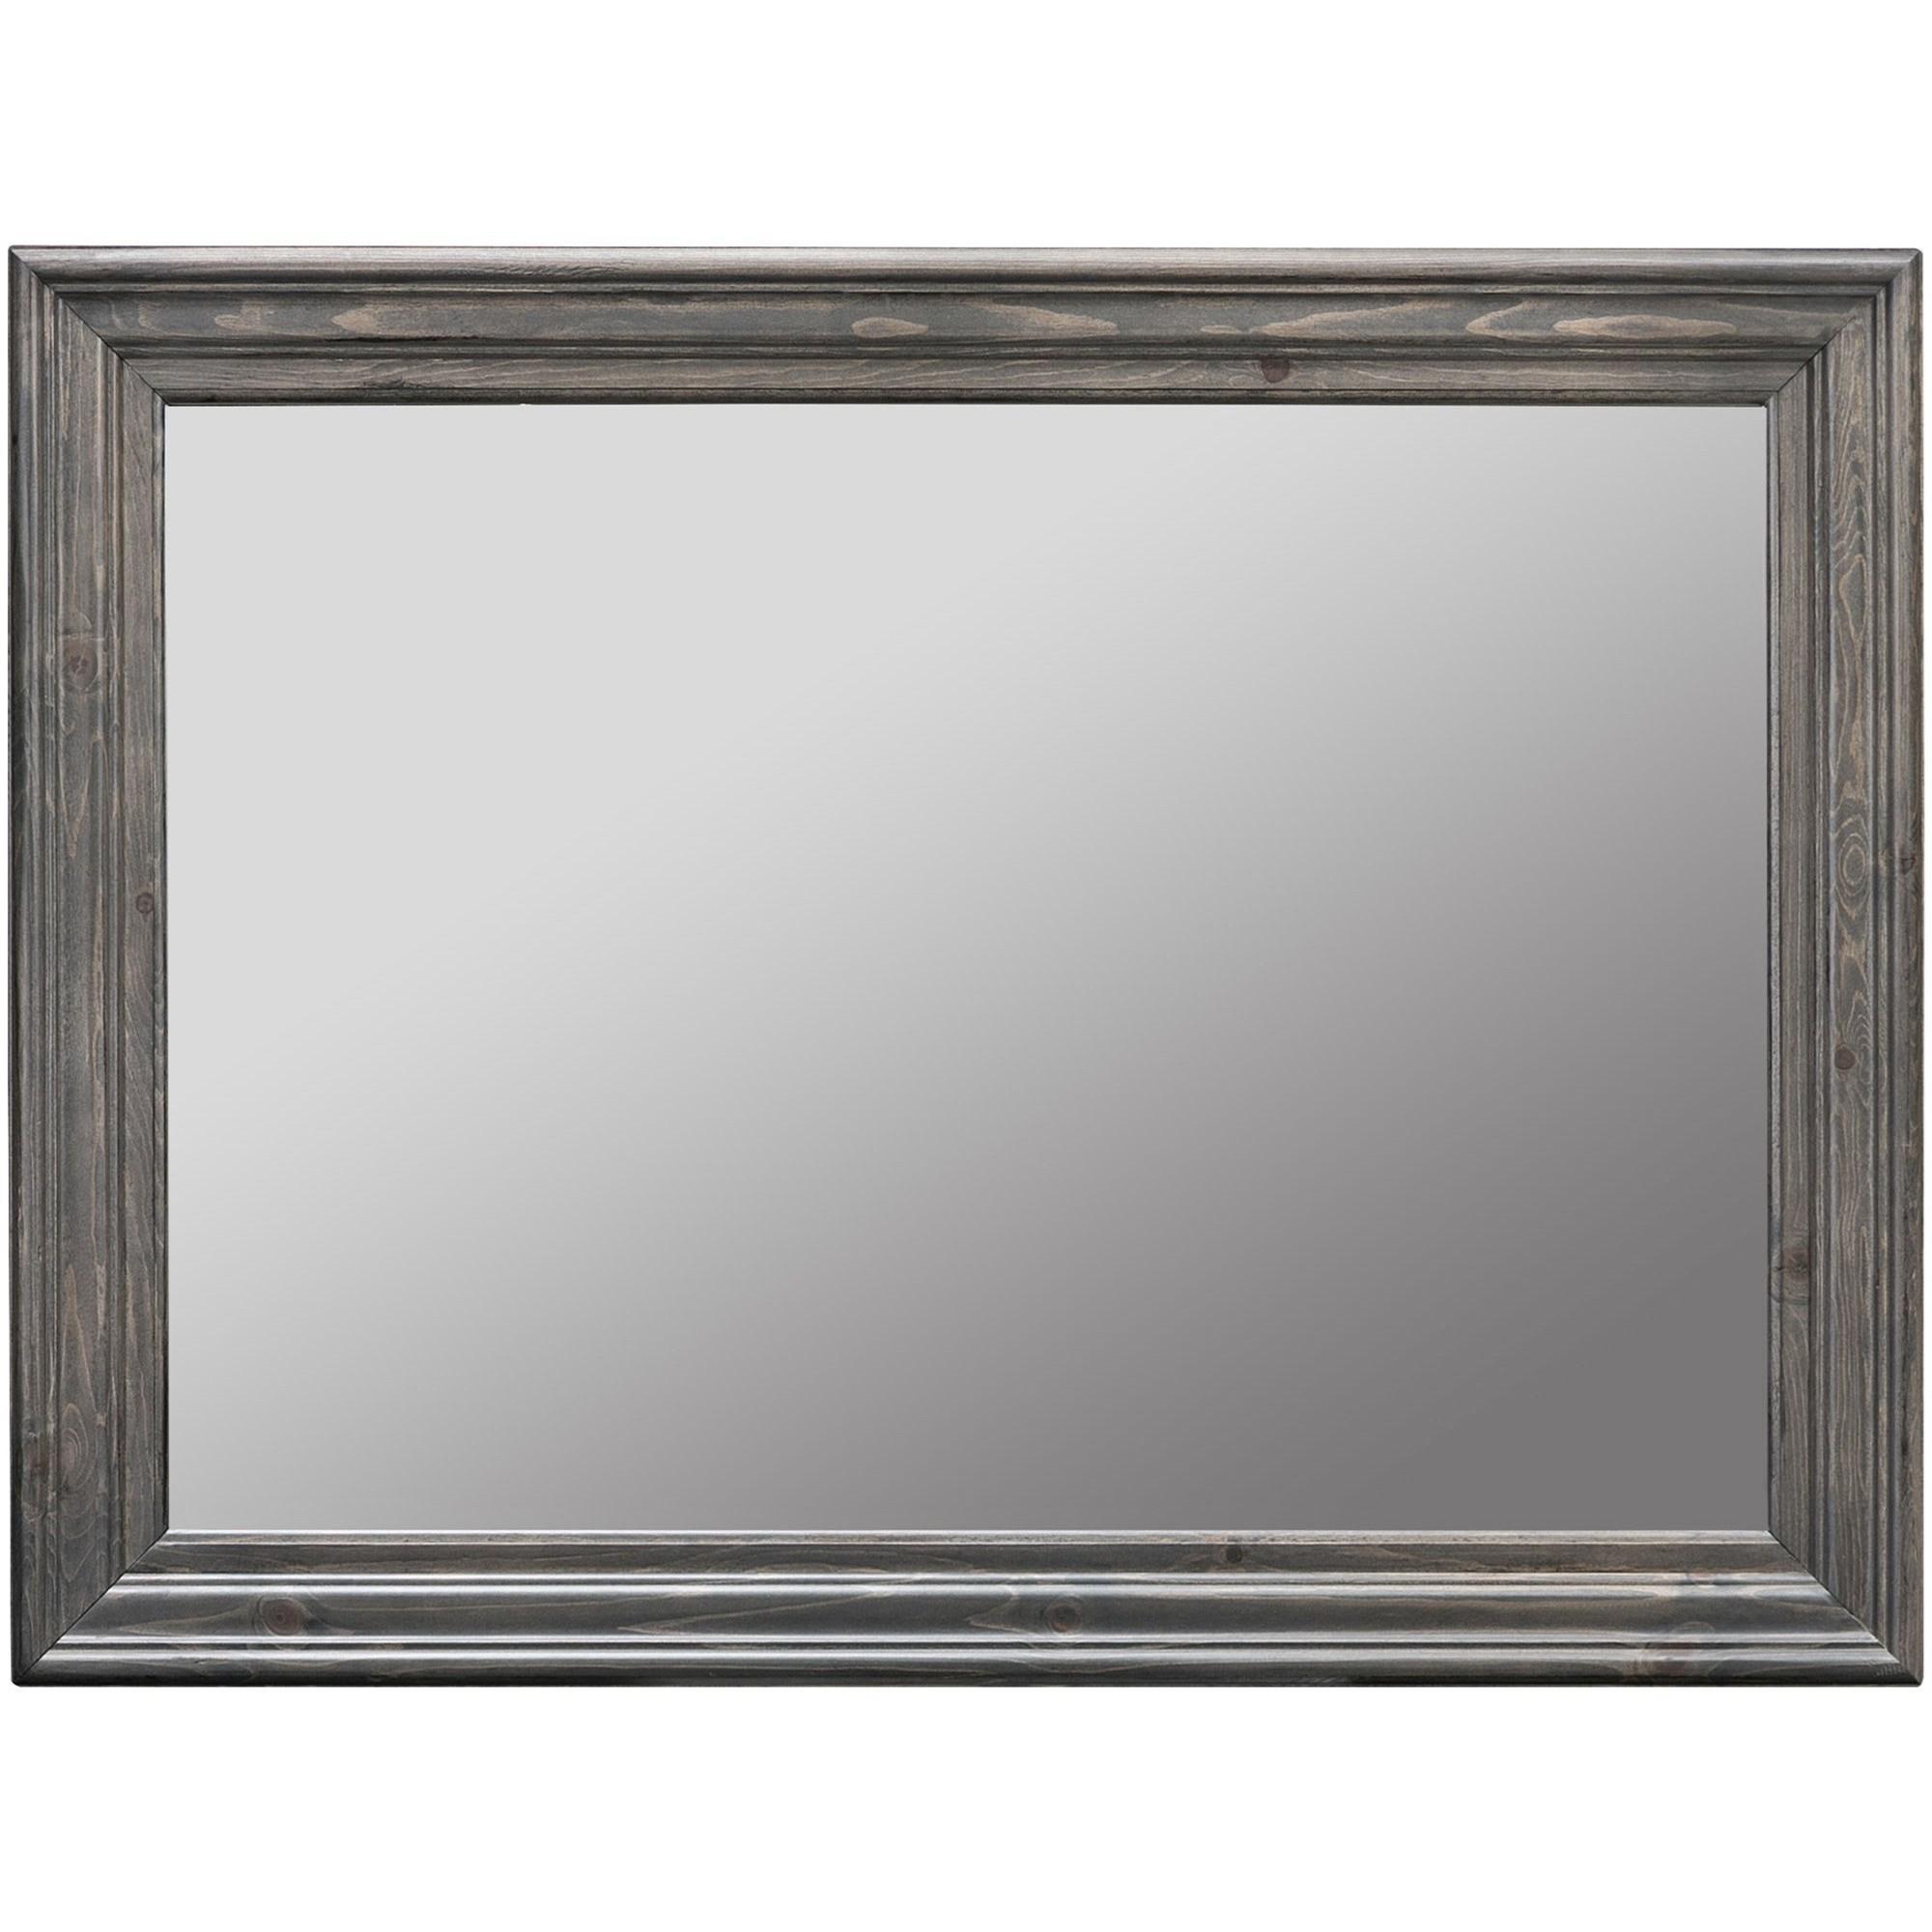 Fordham Mirror by Progressive Furniture at Bullard Furniture